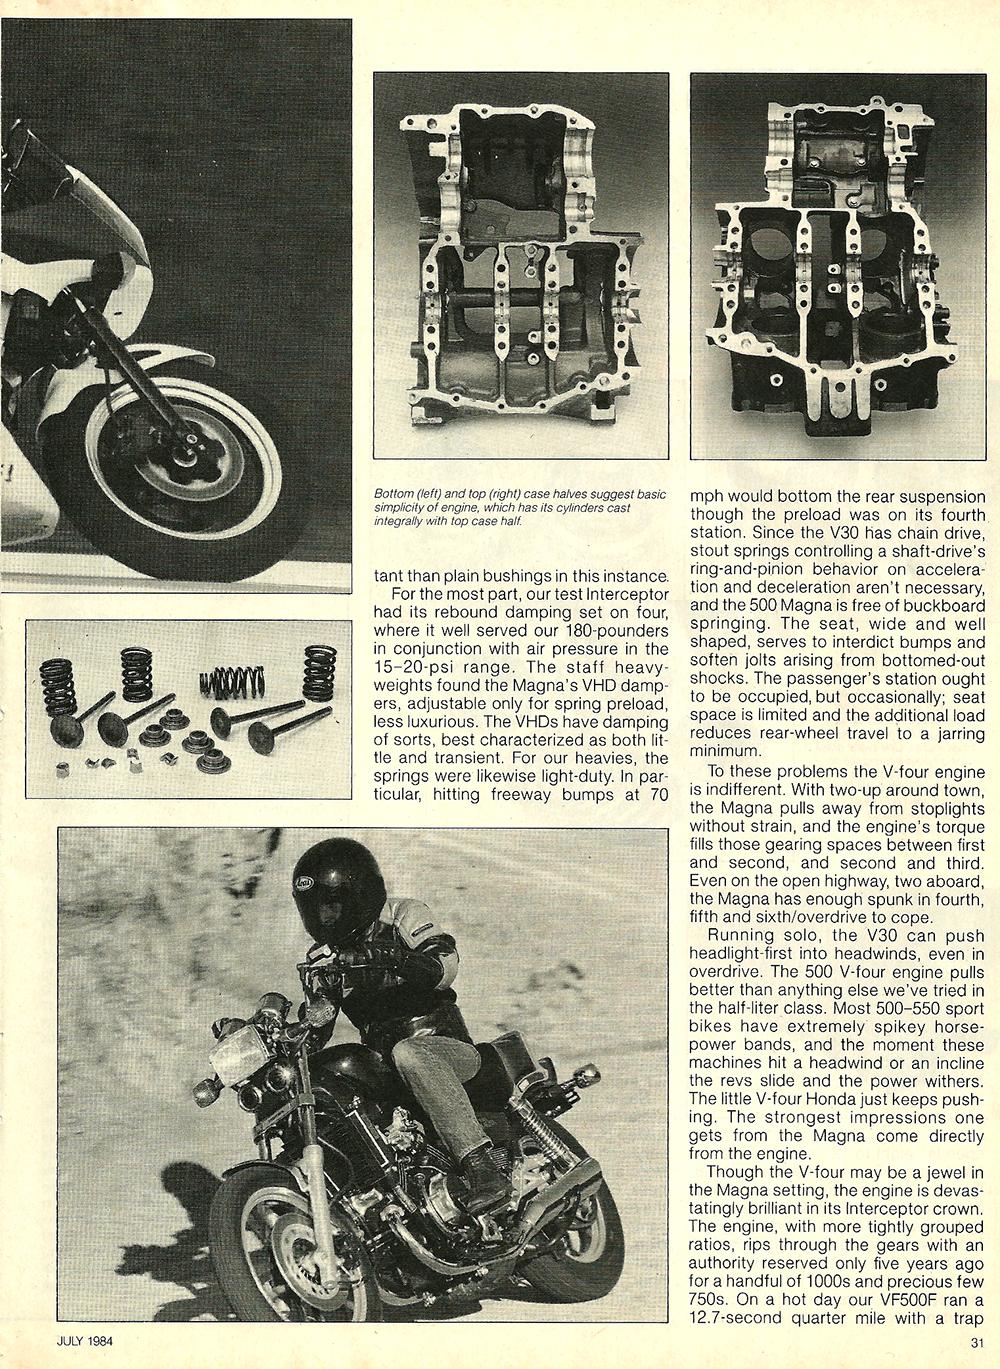 1984 Honda V30 Magna and VF500F Interceptor road test 08.jpg